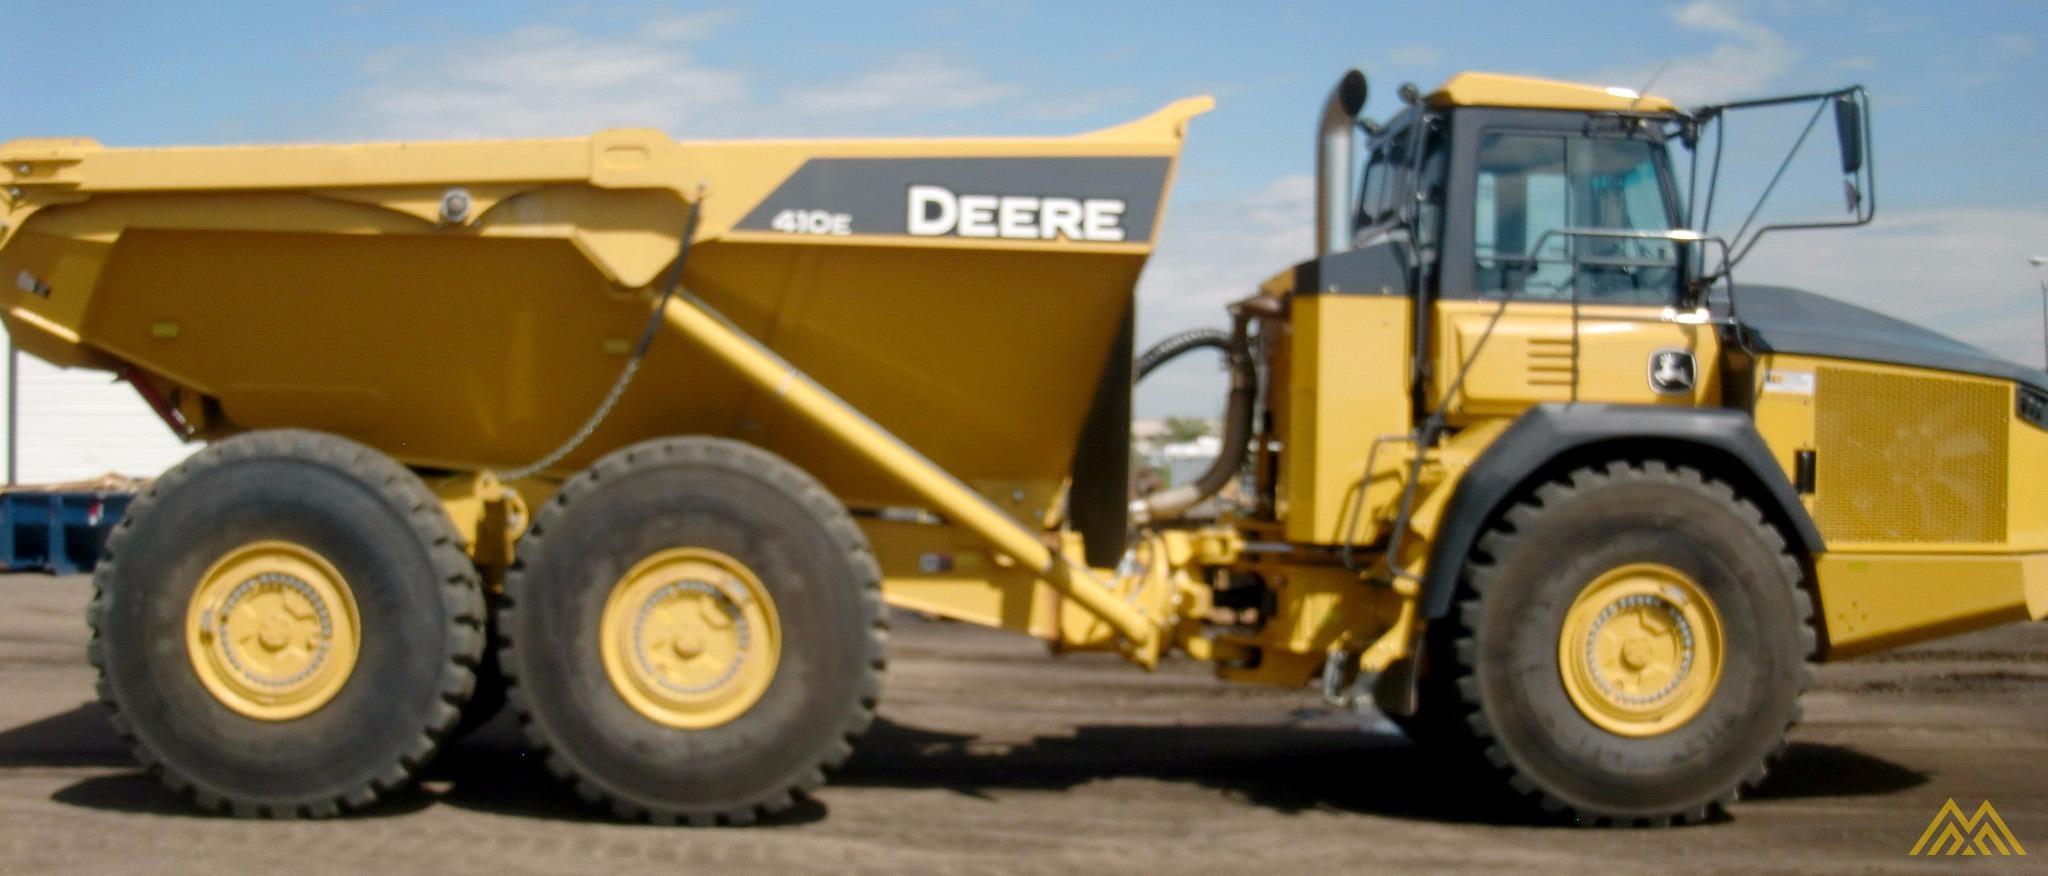 Deere 410E Articulating Dump Truck in Idaho Falls.  4